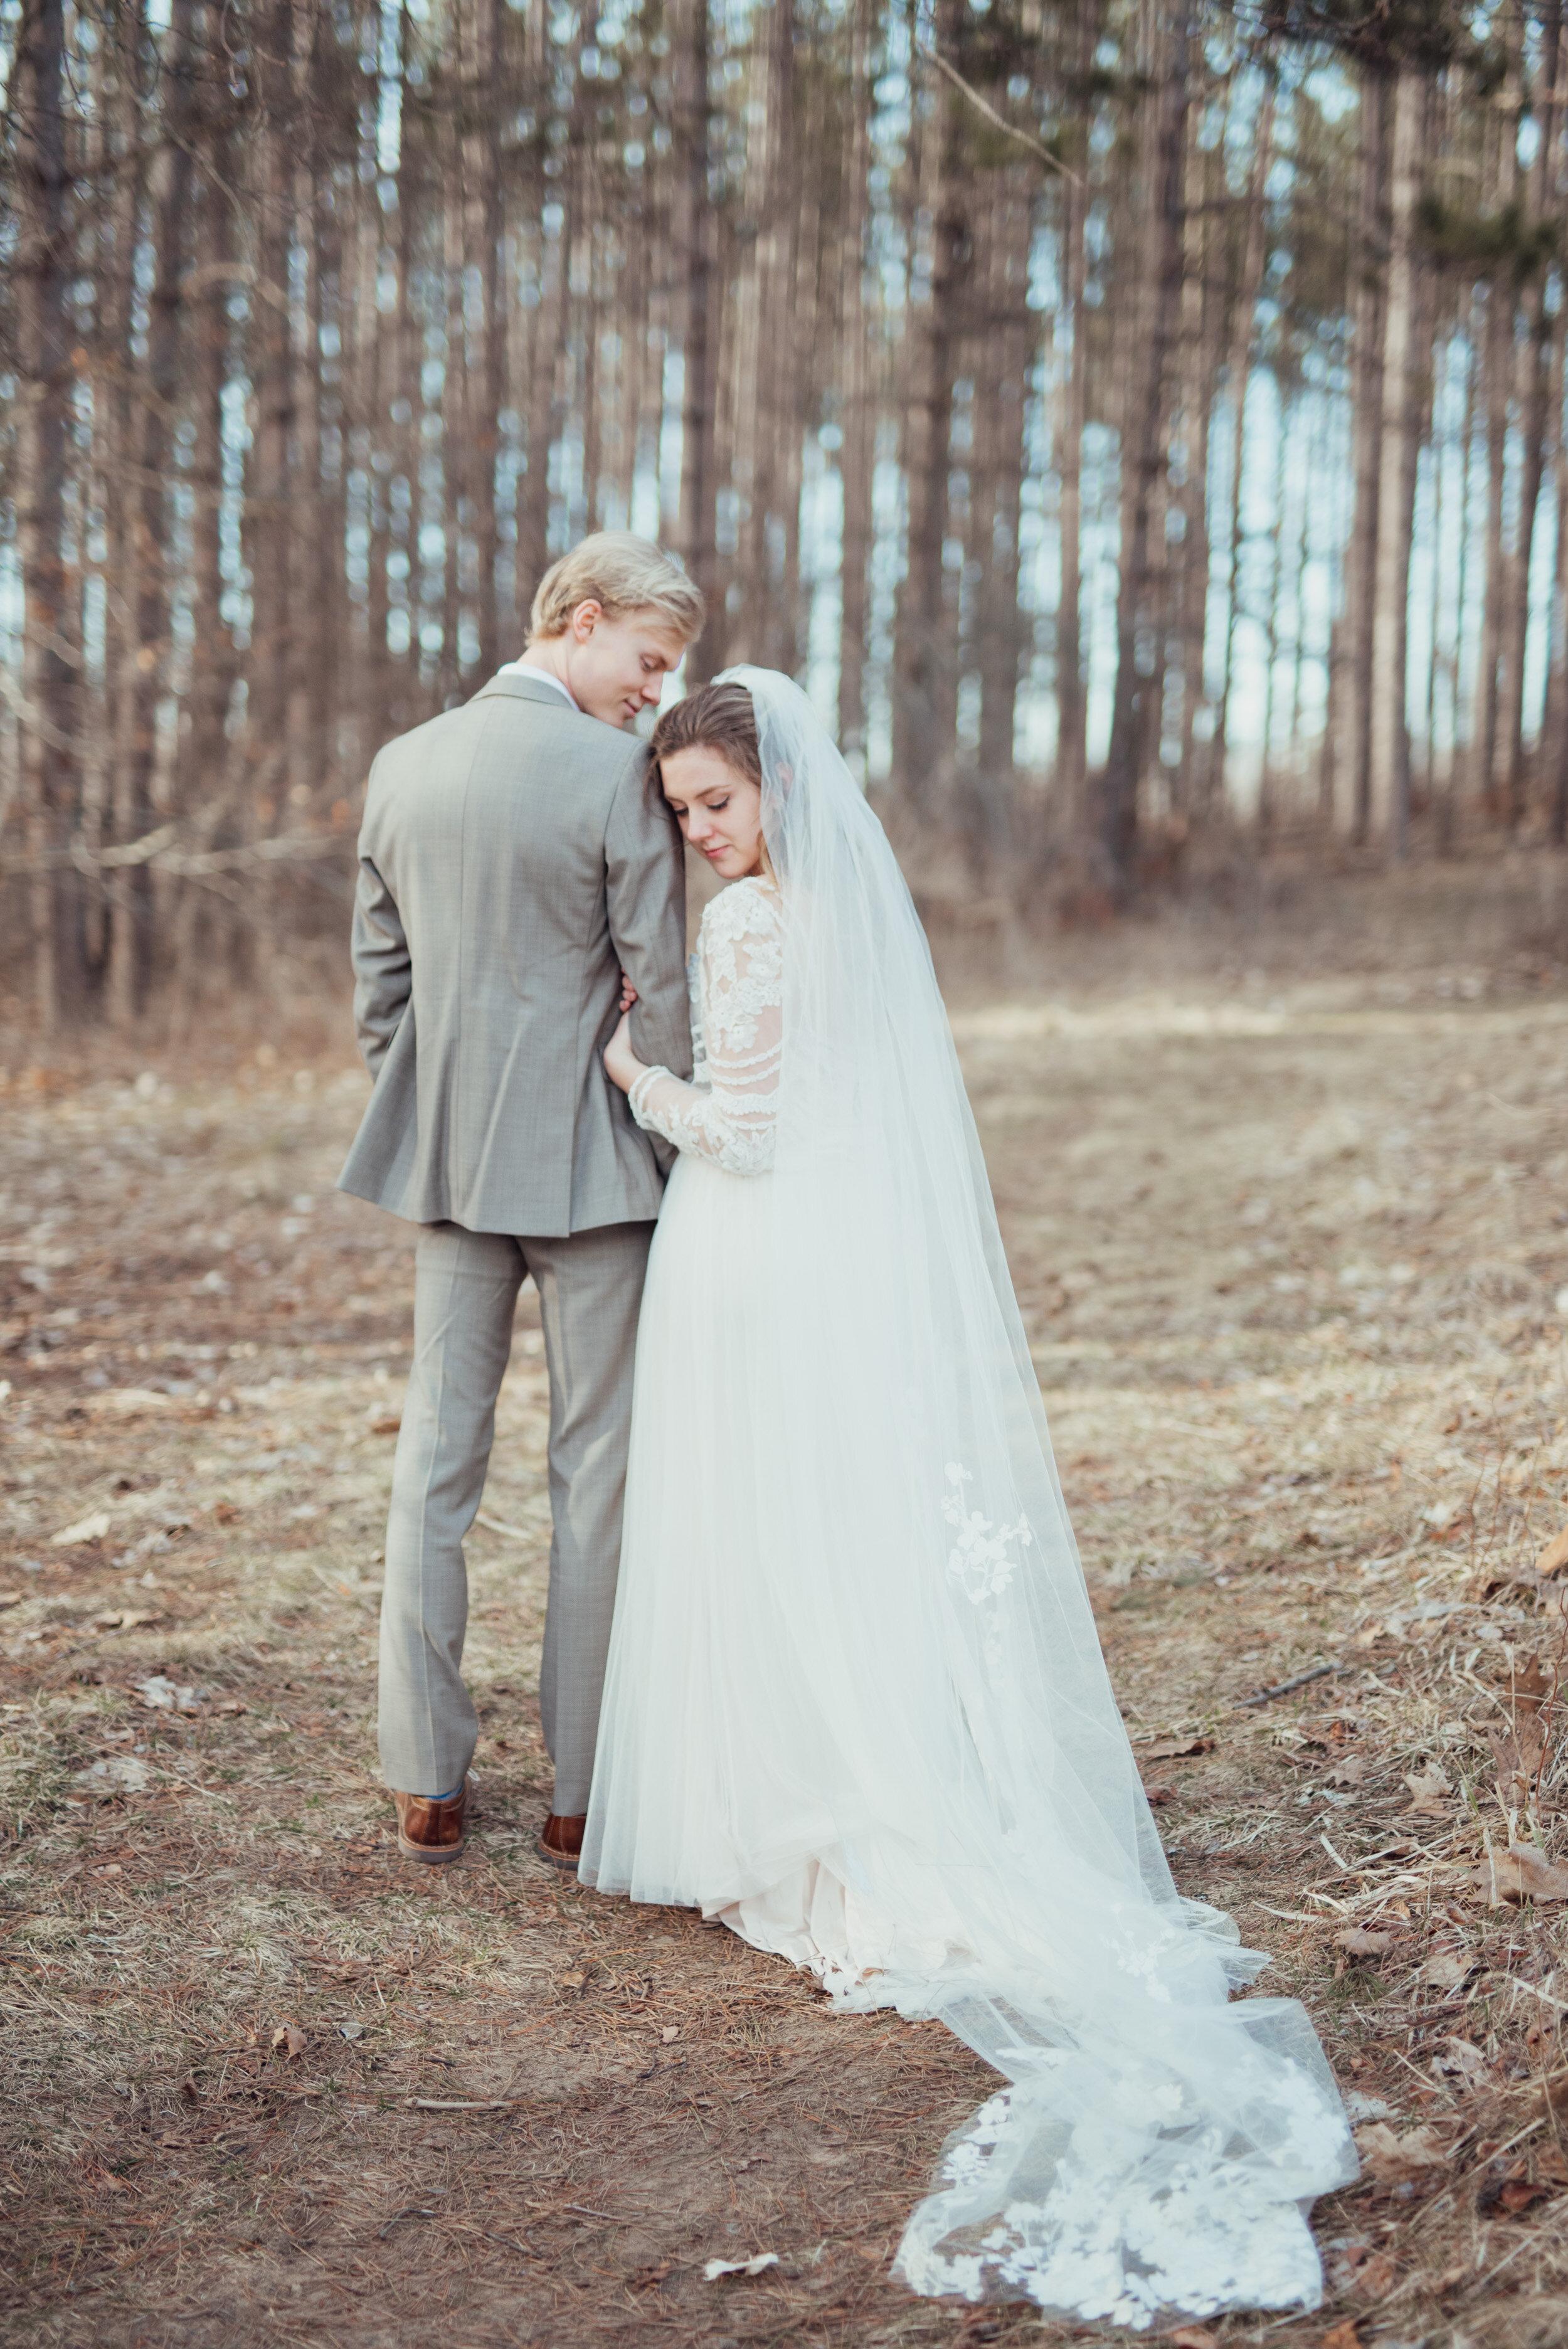 cleland-fine-art-wedding-photography-8.jpg